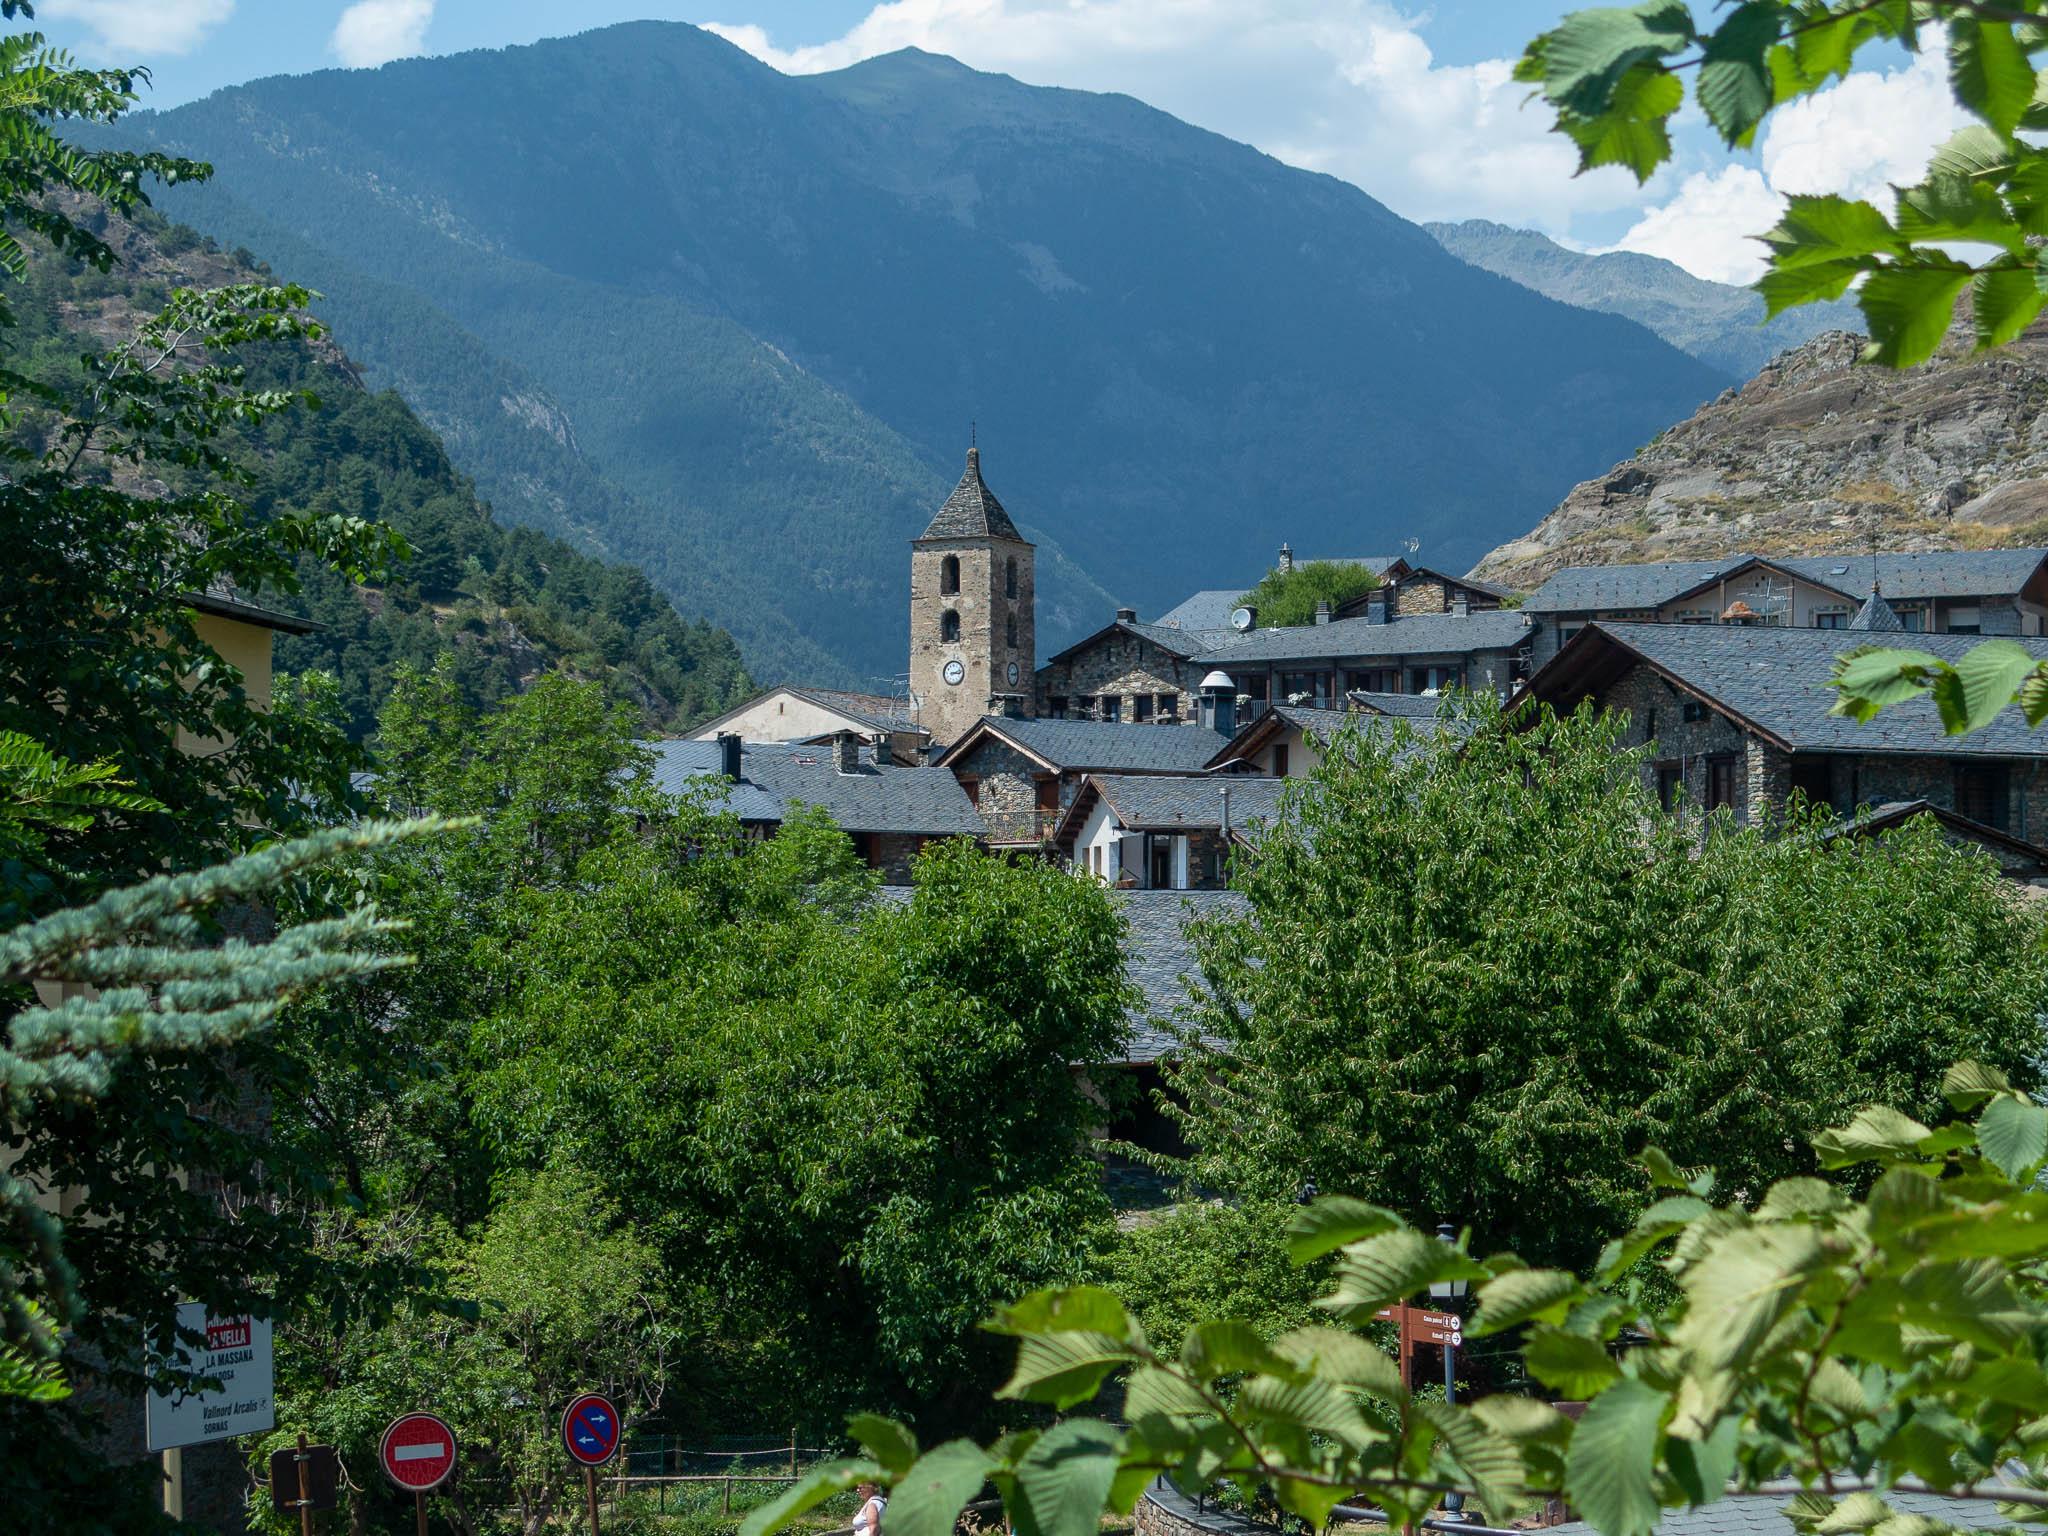 Ordino Kirchturm und Dorf, Andorra